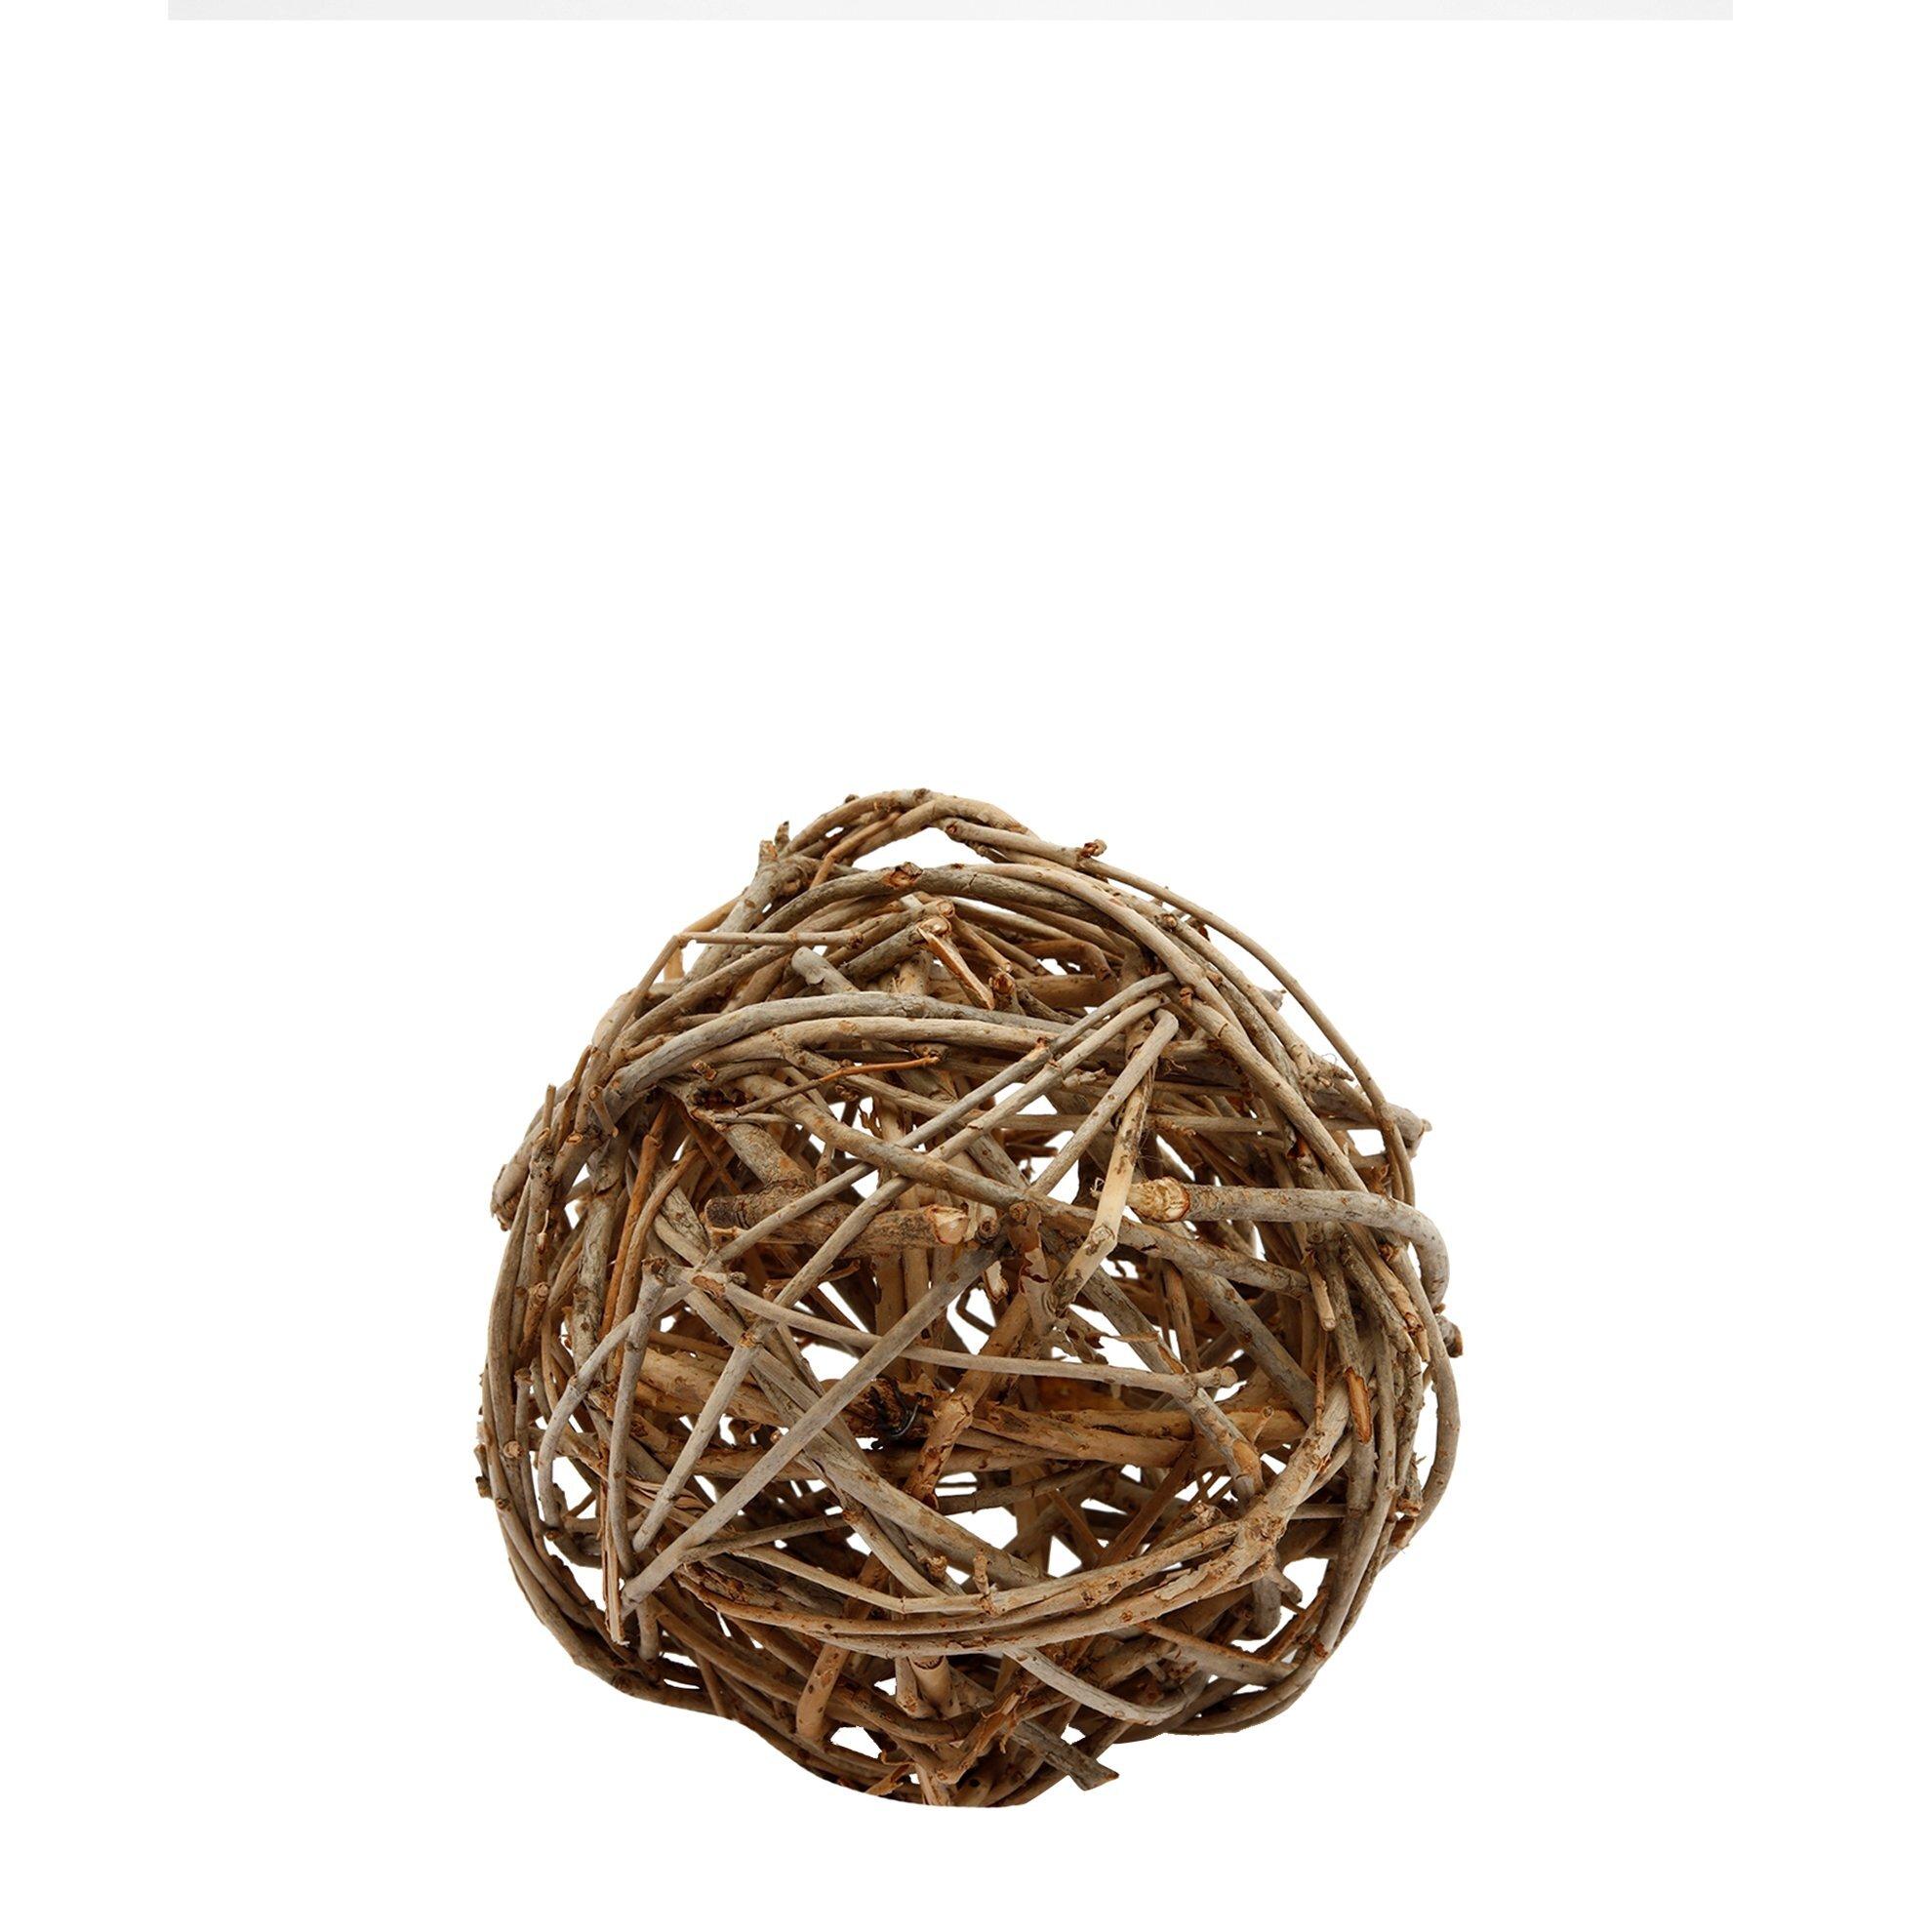 Decorative Natural Ball